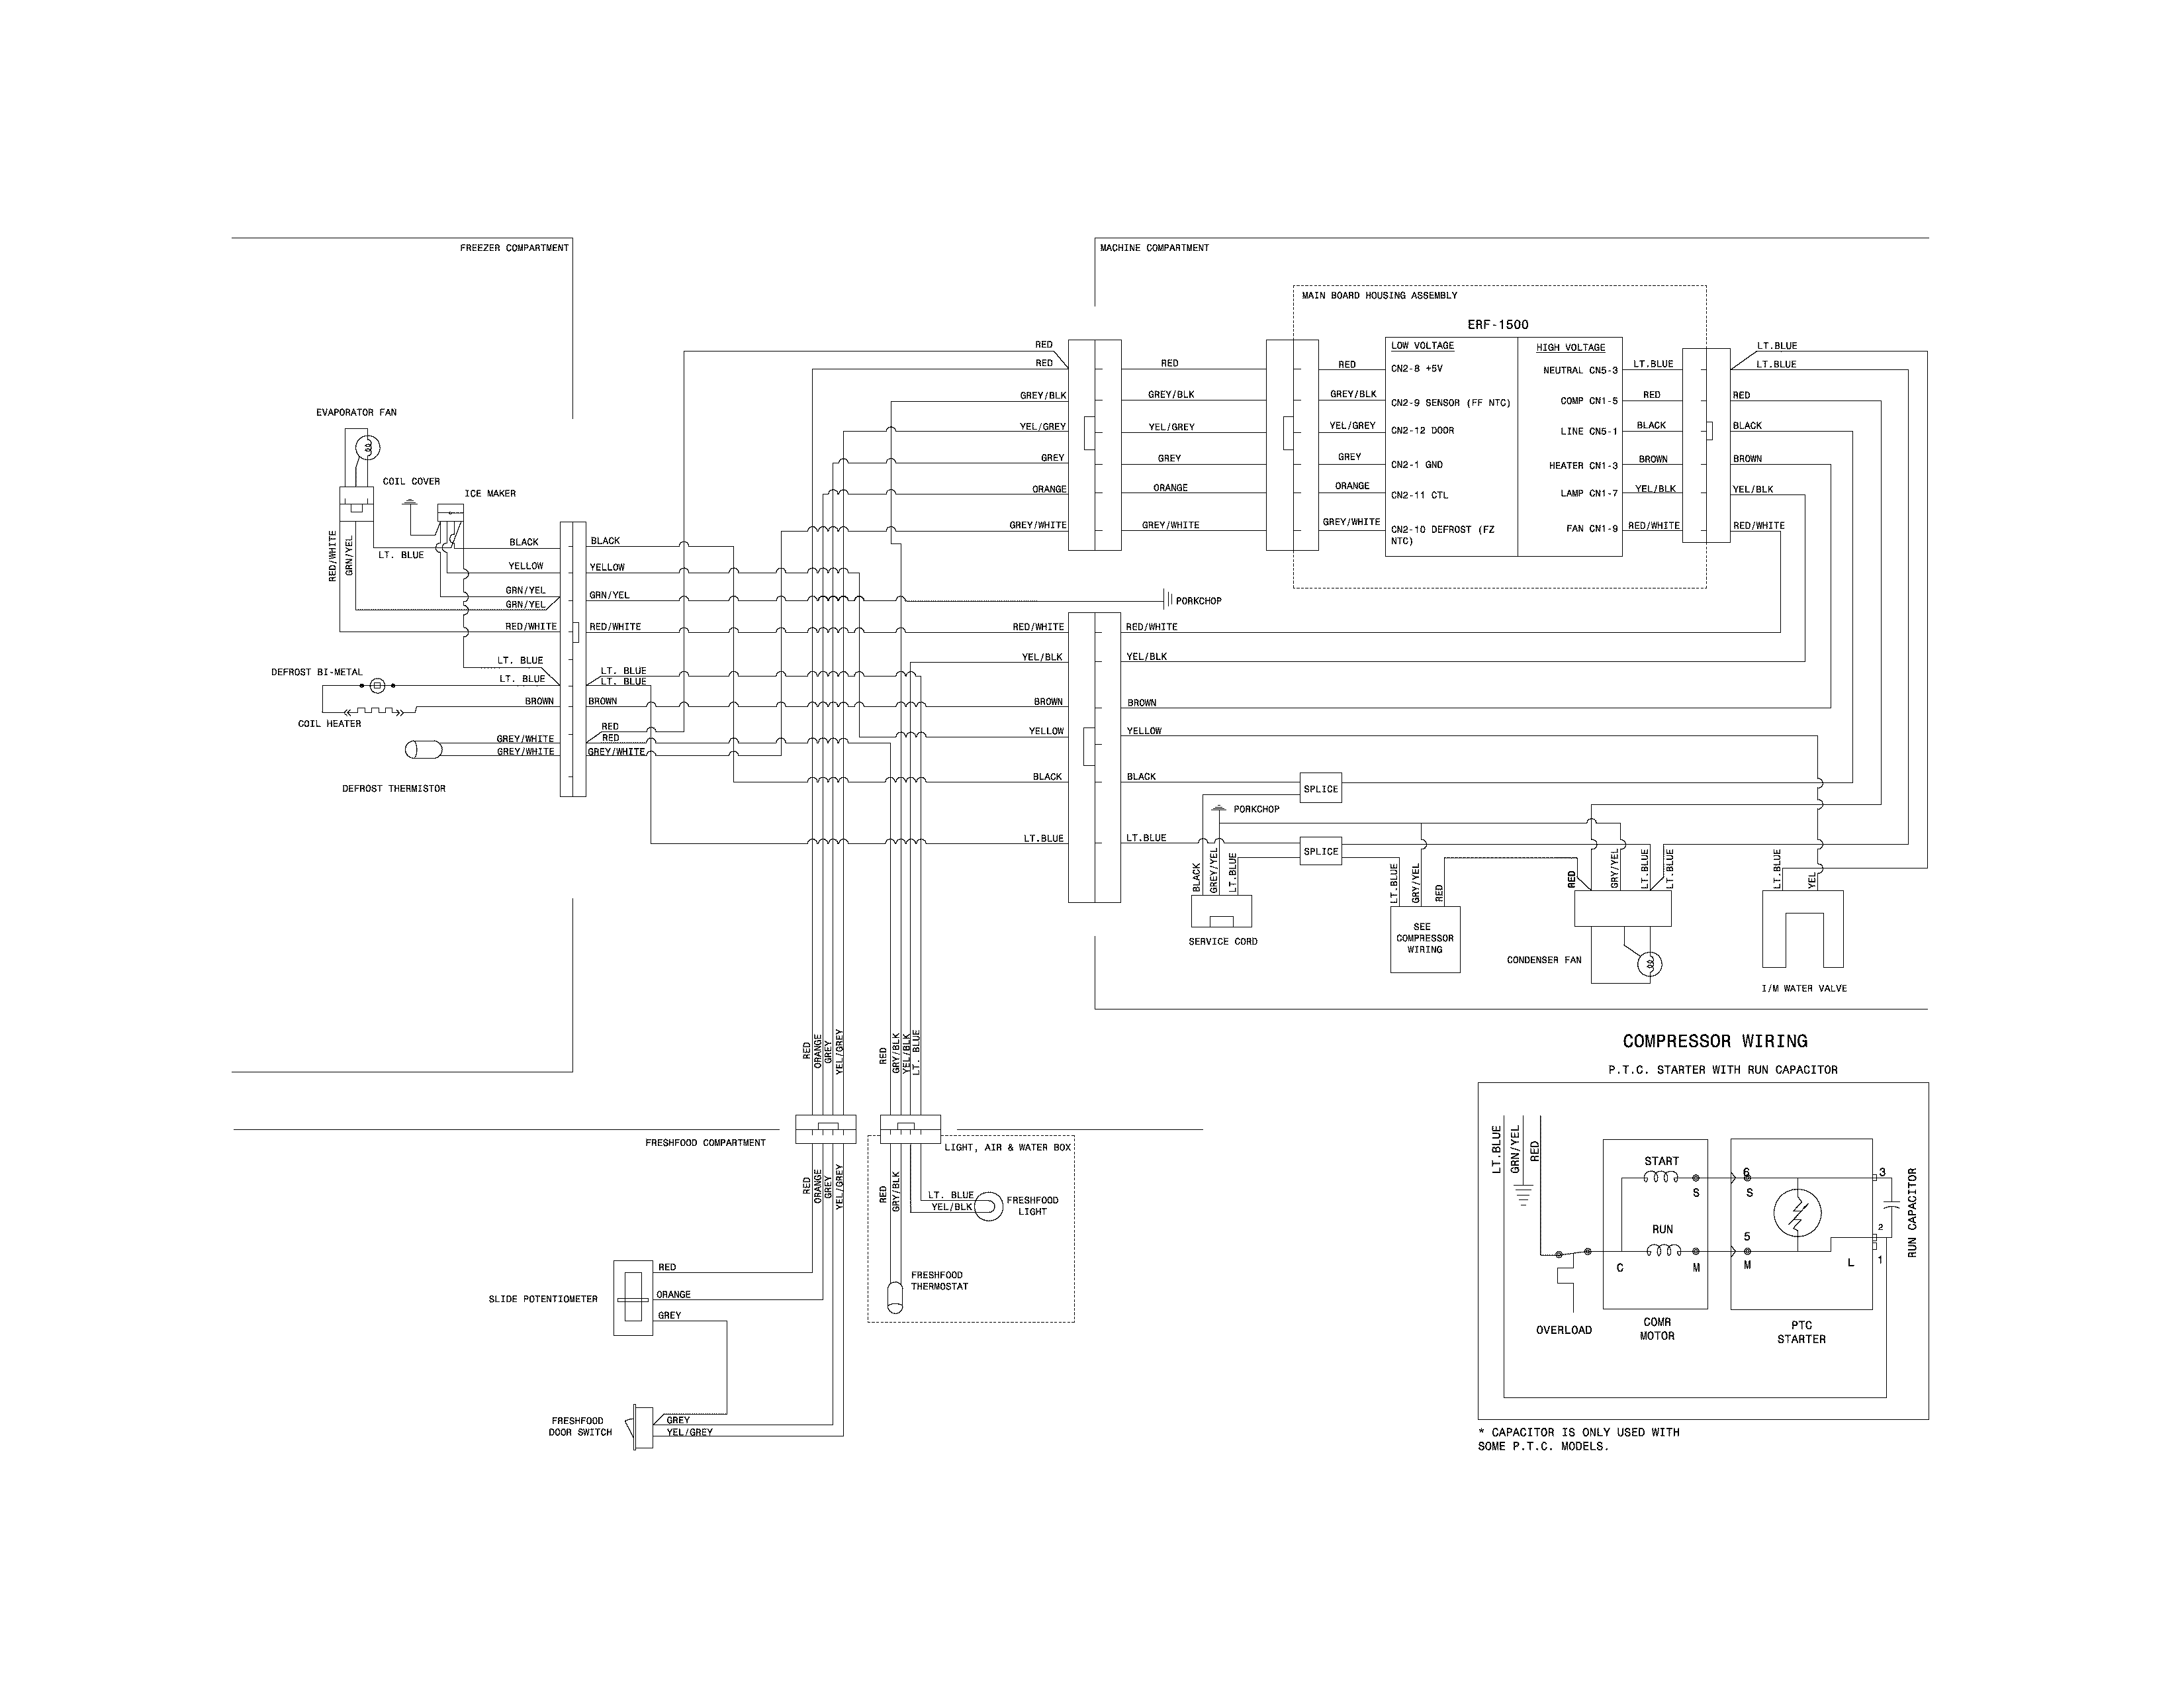 wiring diagram for crosley dryer vo 3808  freezer parts diagram engine car parts and on crosley  freezer parts diagram engine car parts